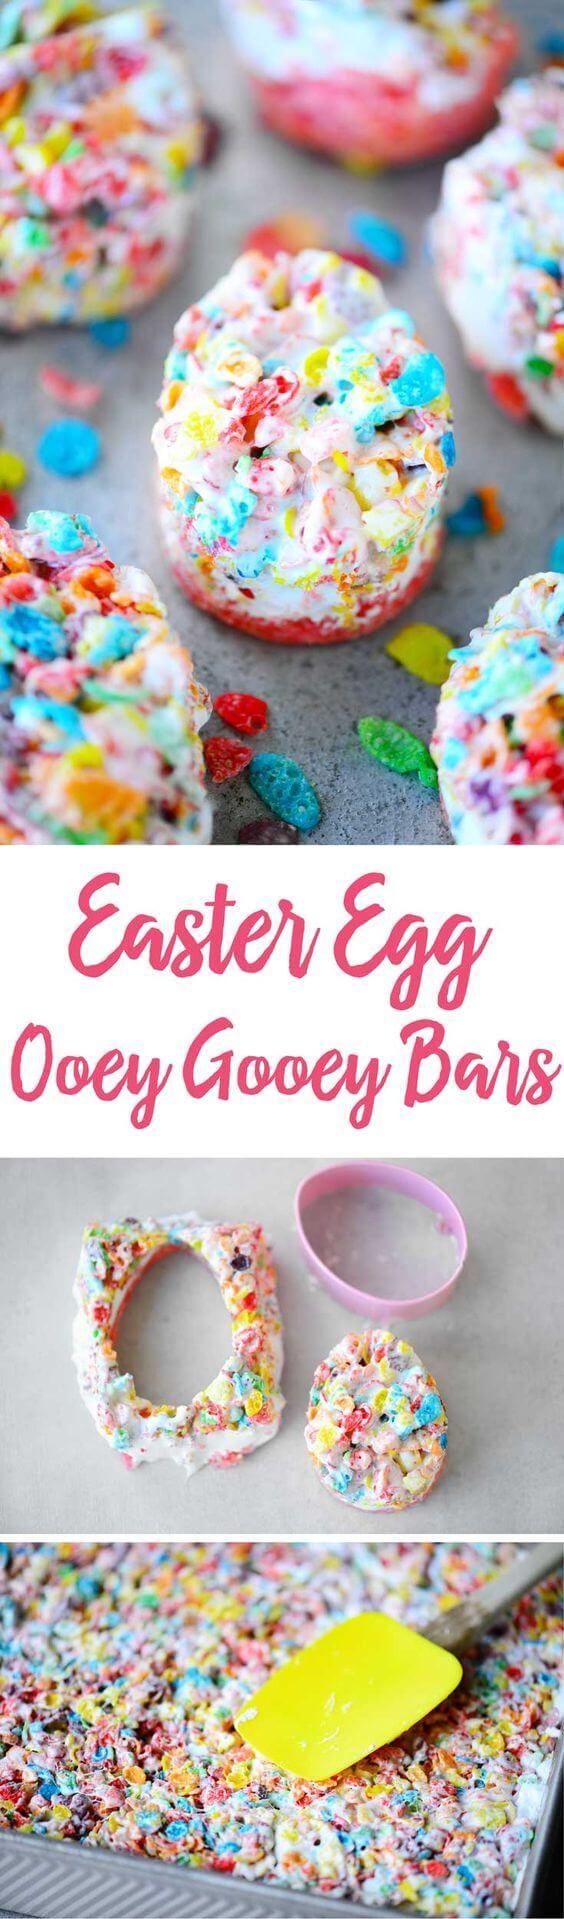 cool Strawberry Ooey Gooey Bars